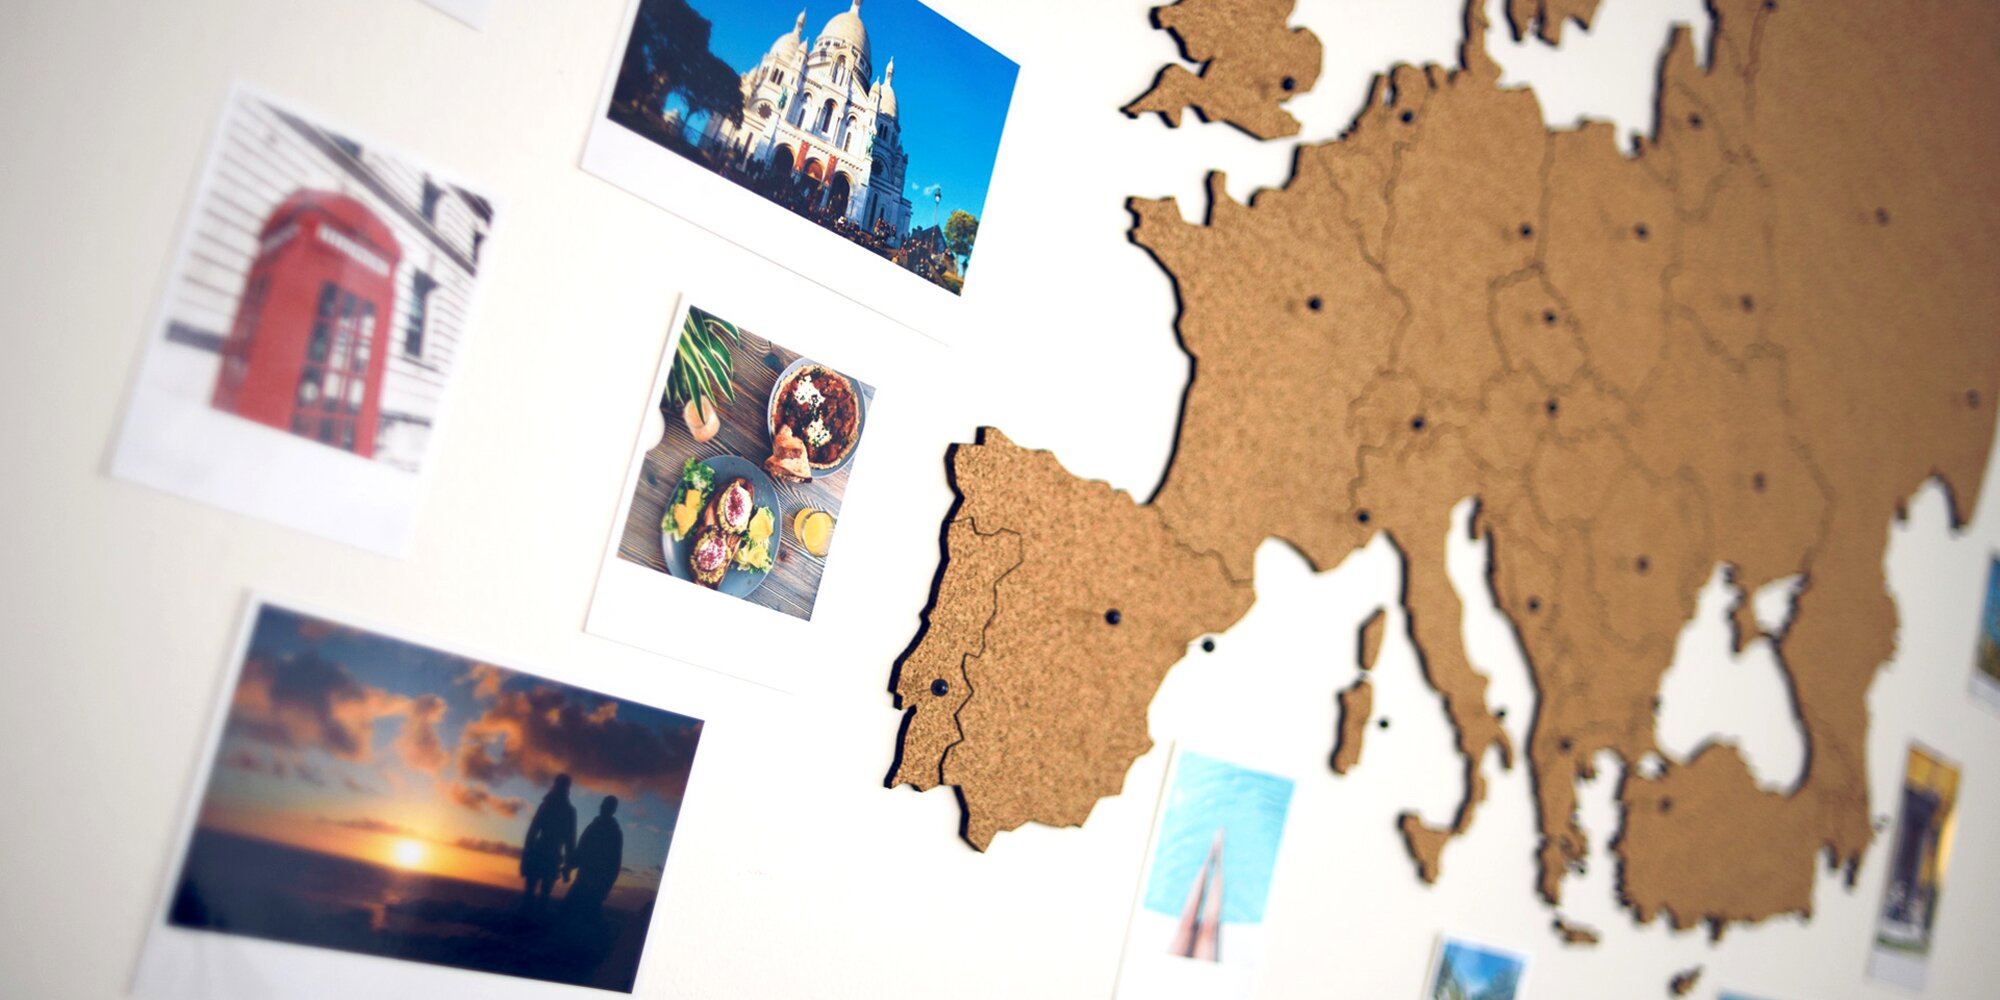 Samolepici Korkove Mapy Na Zed Cesko I Evropa Slevomat Cz